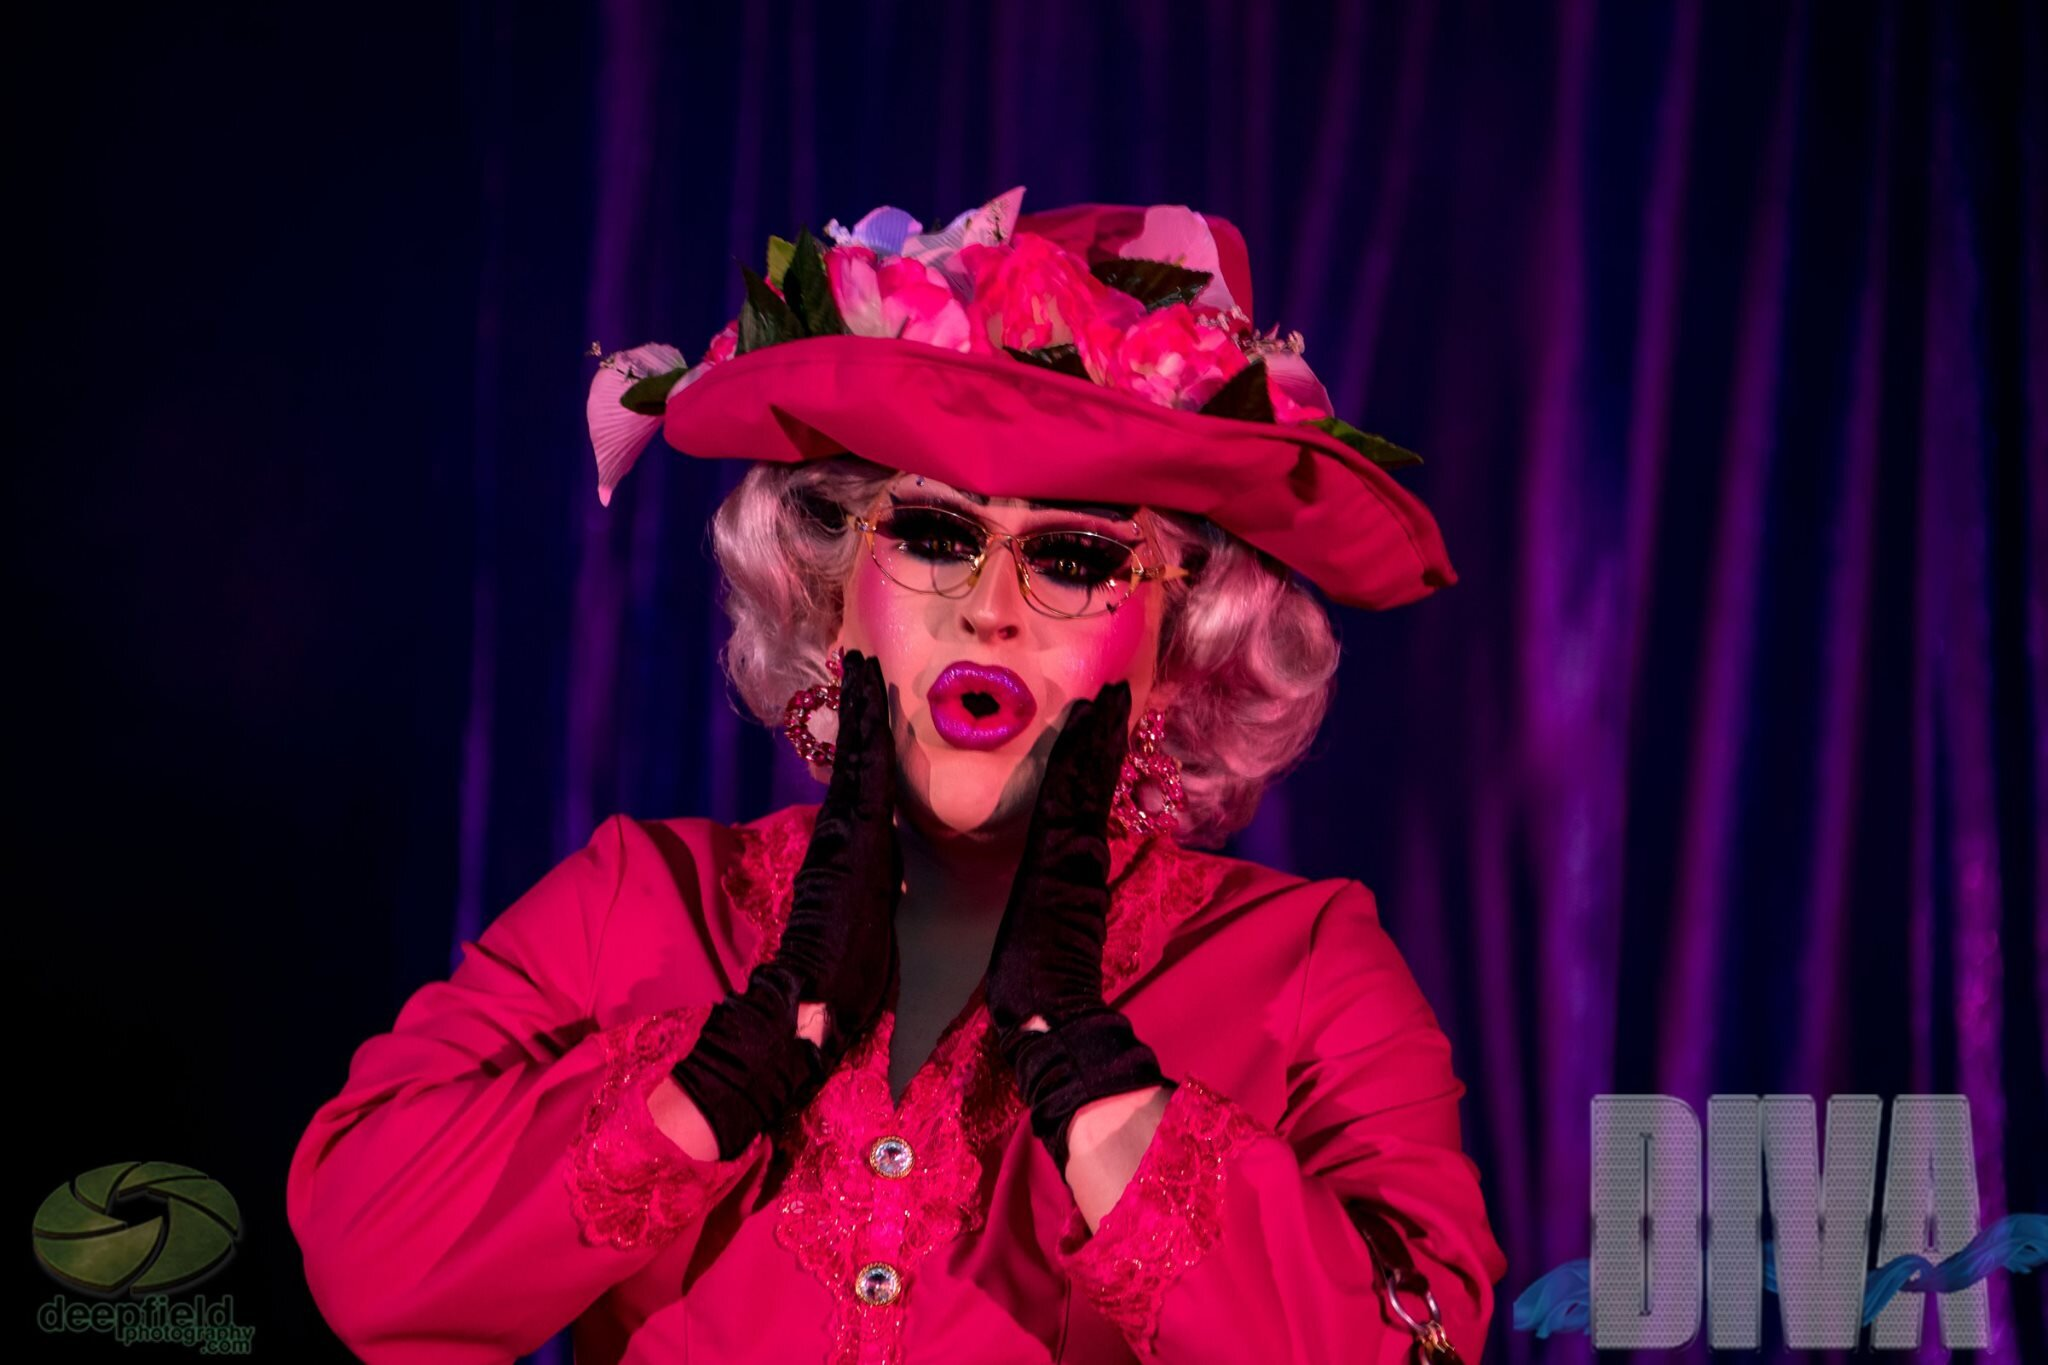 hannah-conda--queen-elizabeth-second-uk-diva-awards-sydney-drag-queen-royalty-best-hire-drag-race-australia.jpg